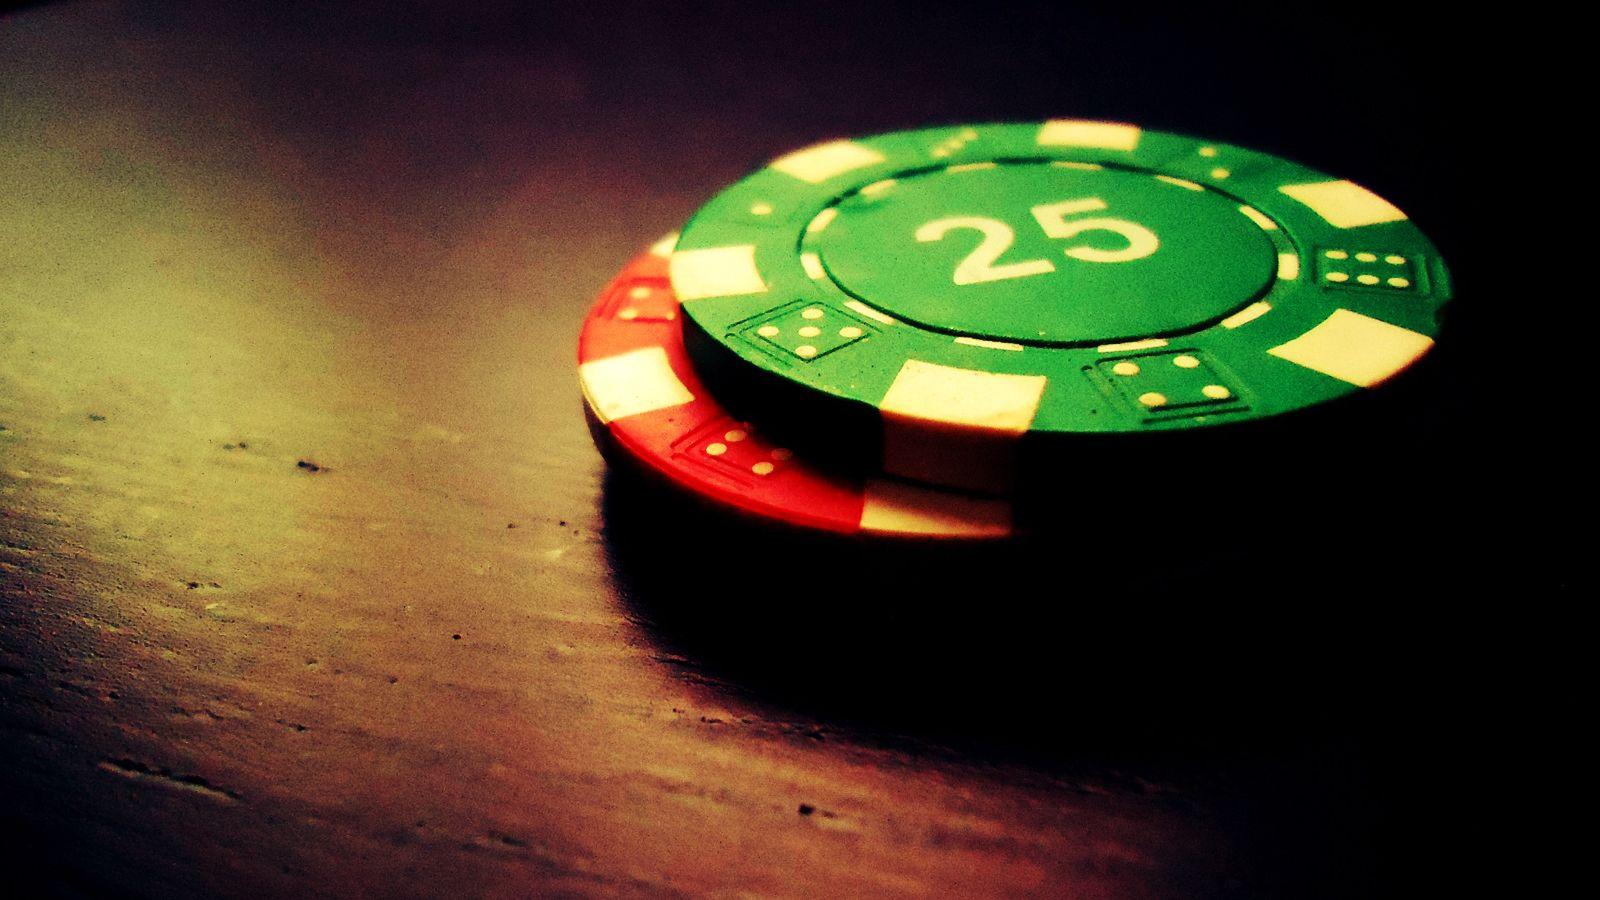 Best Iphone Poker App 2019 Fliptroniks Poker Chips Poker Casino